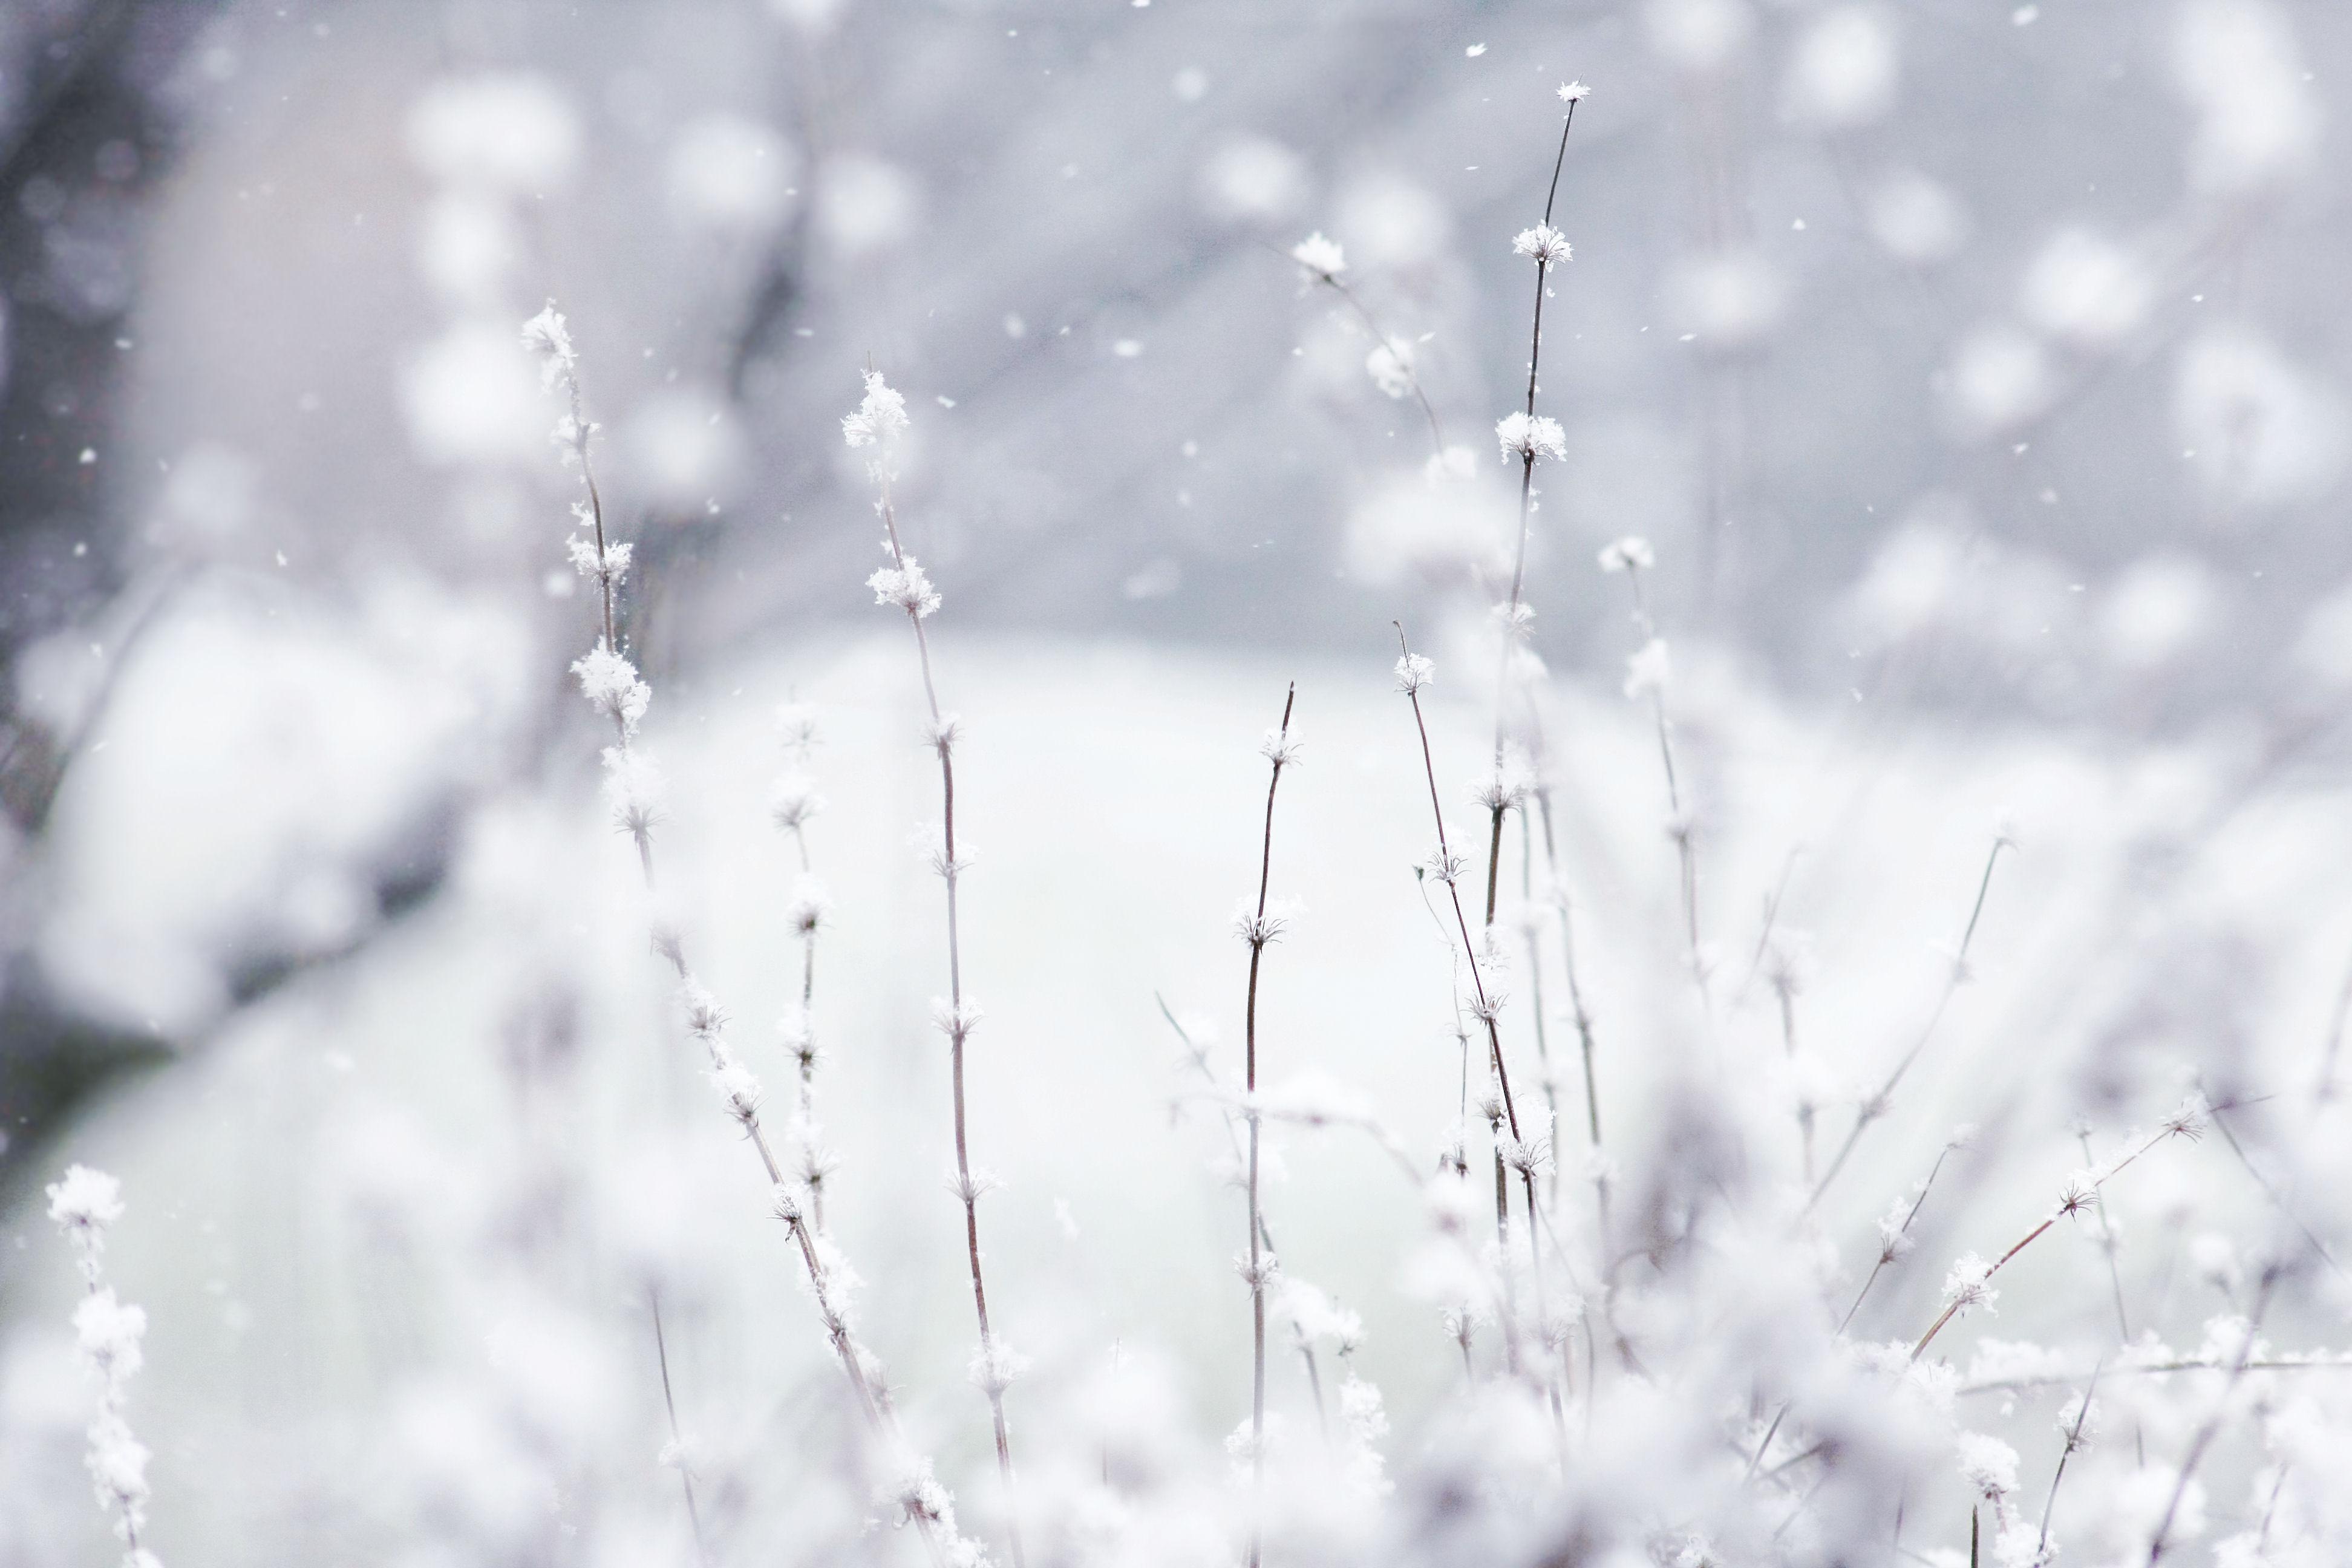 Winter Wallpaper Backgrounds - WallpaperSafari